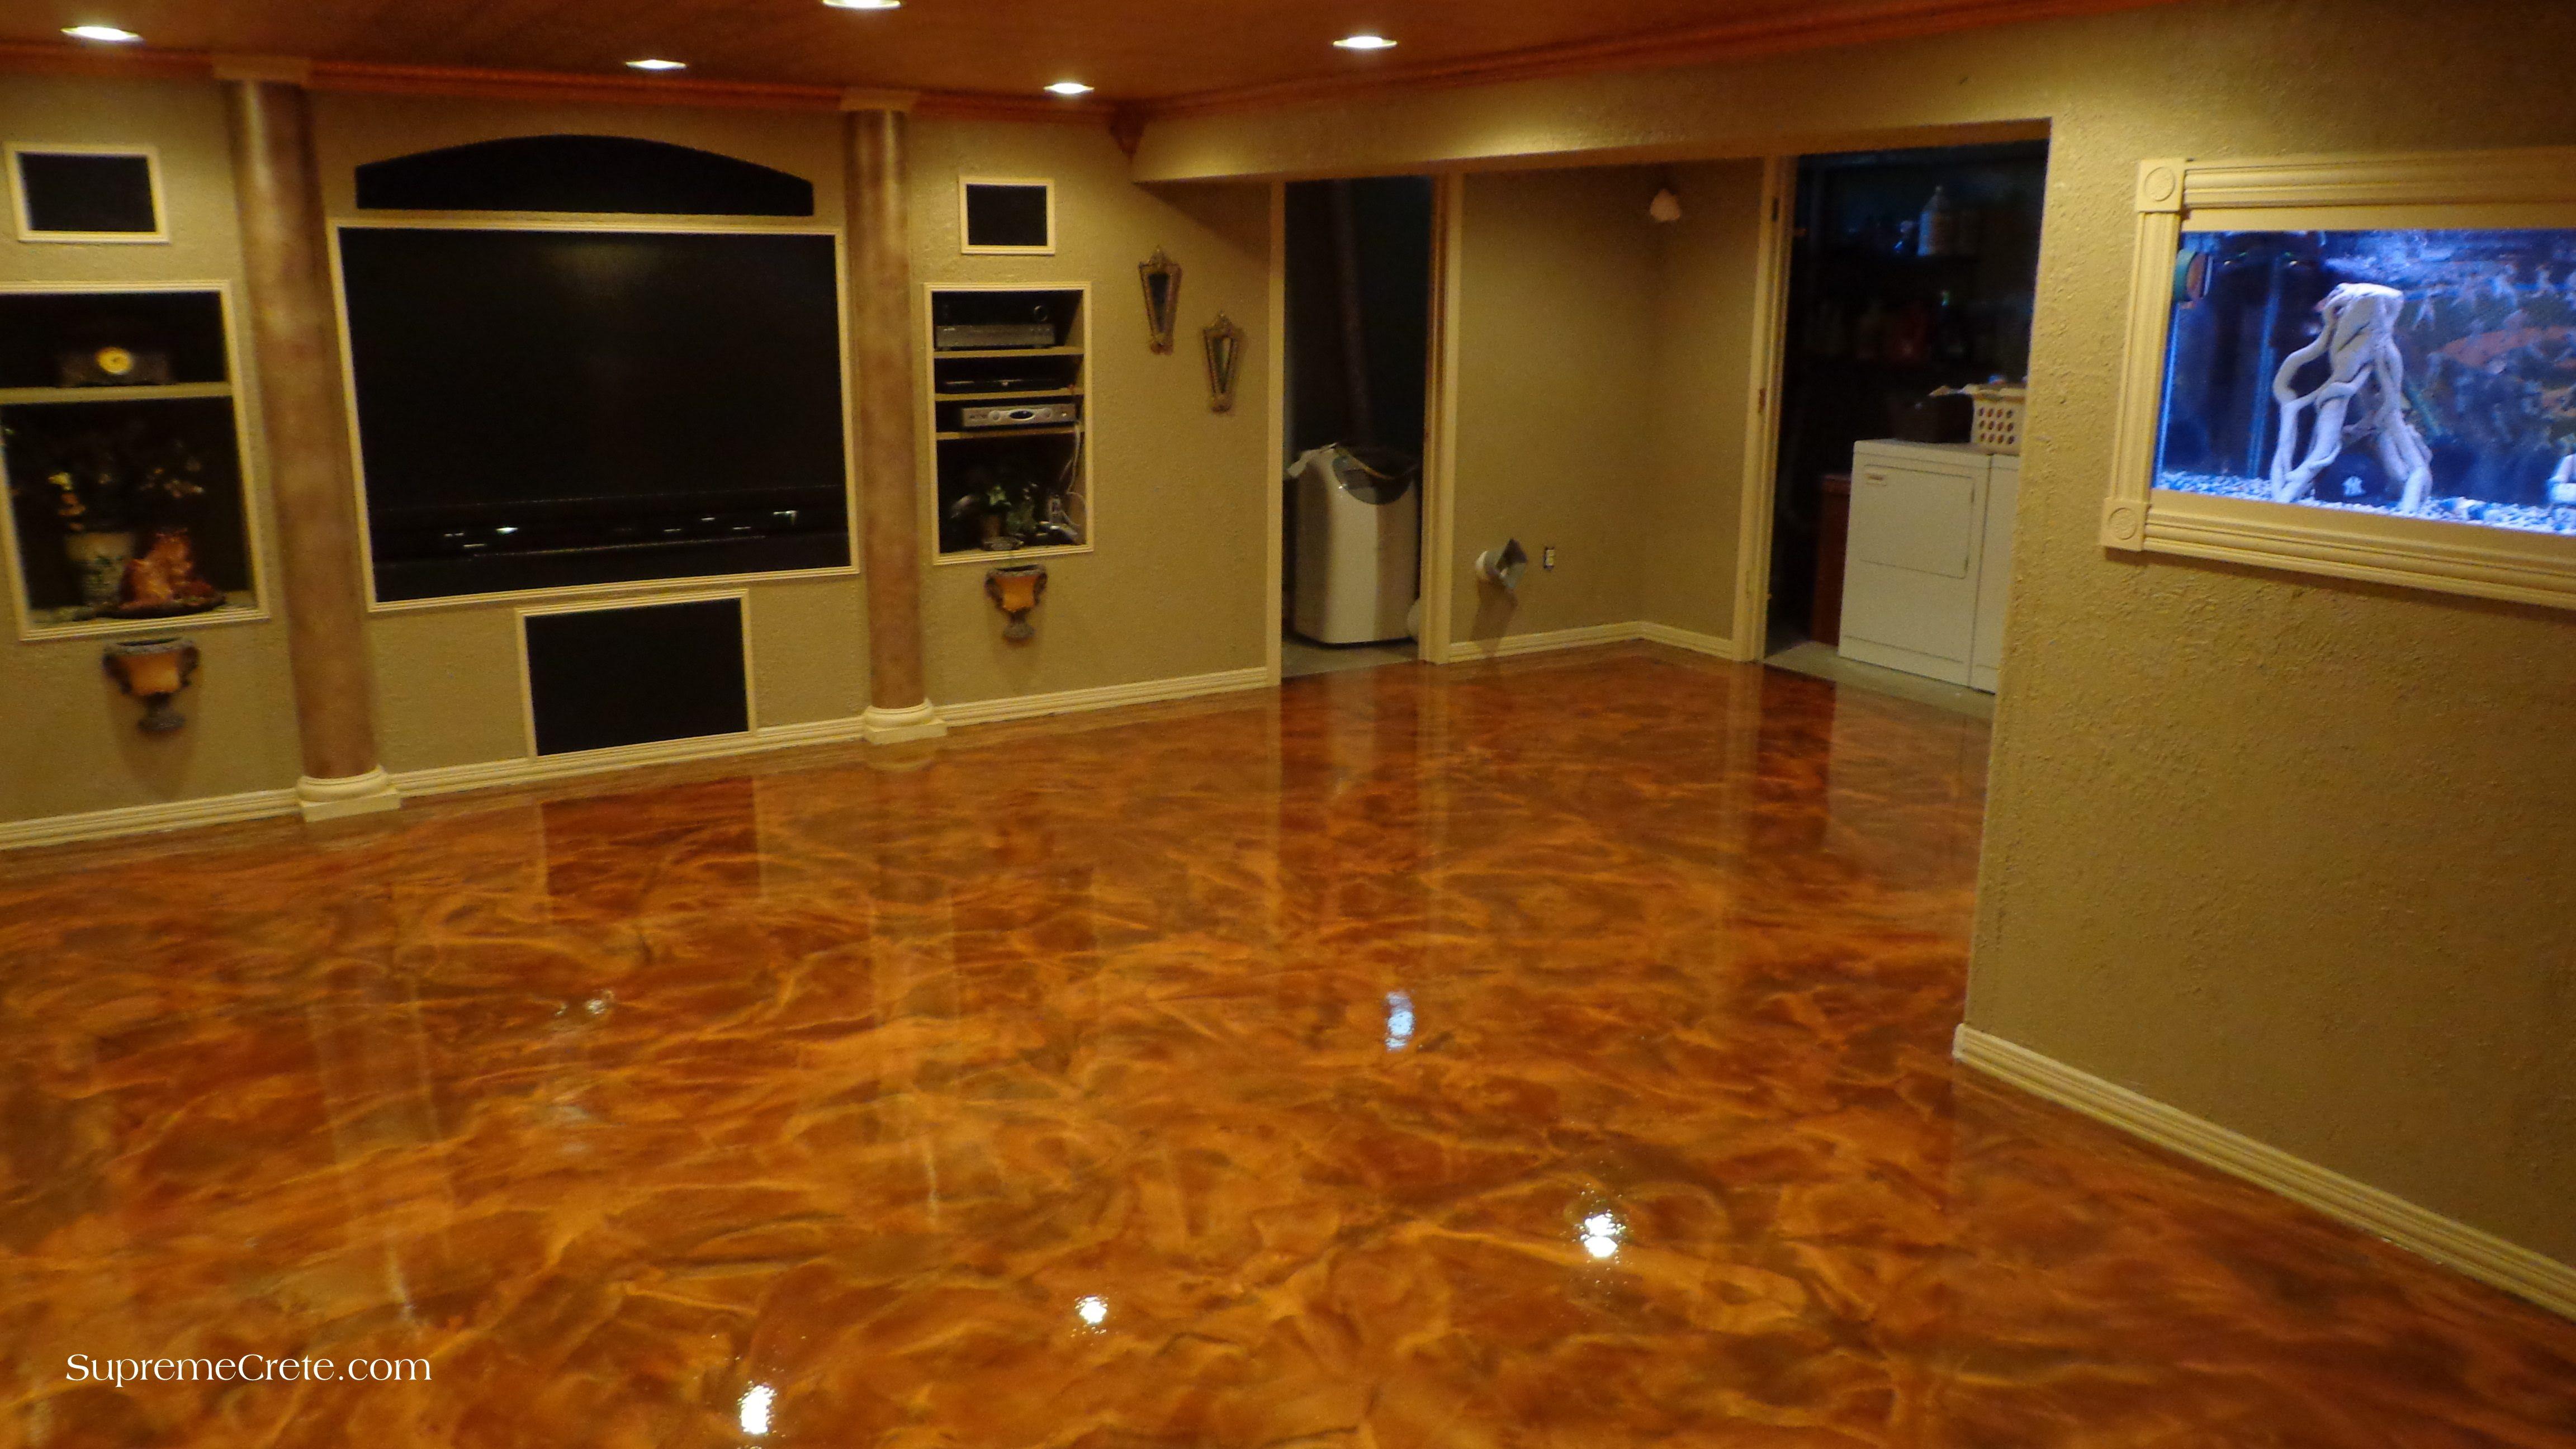 metallic marble lima oh tv utility room tank_9514748898_o